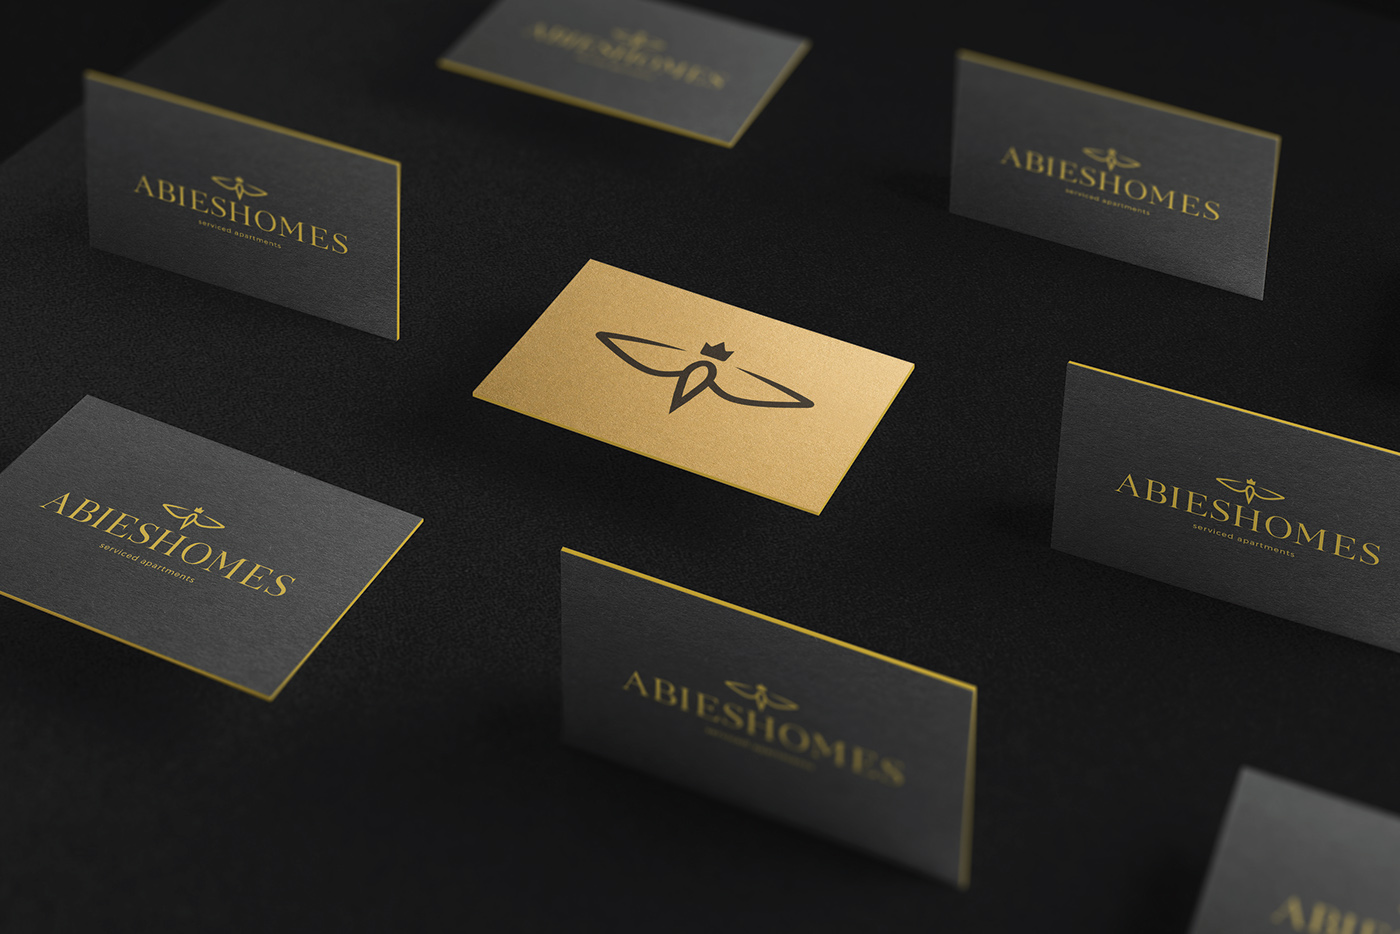 Abieshomes Visitenkarten